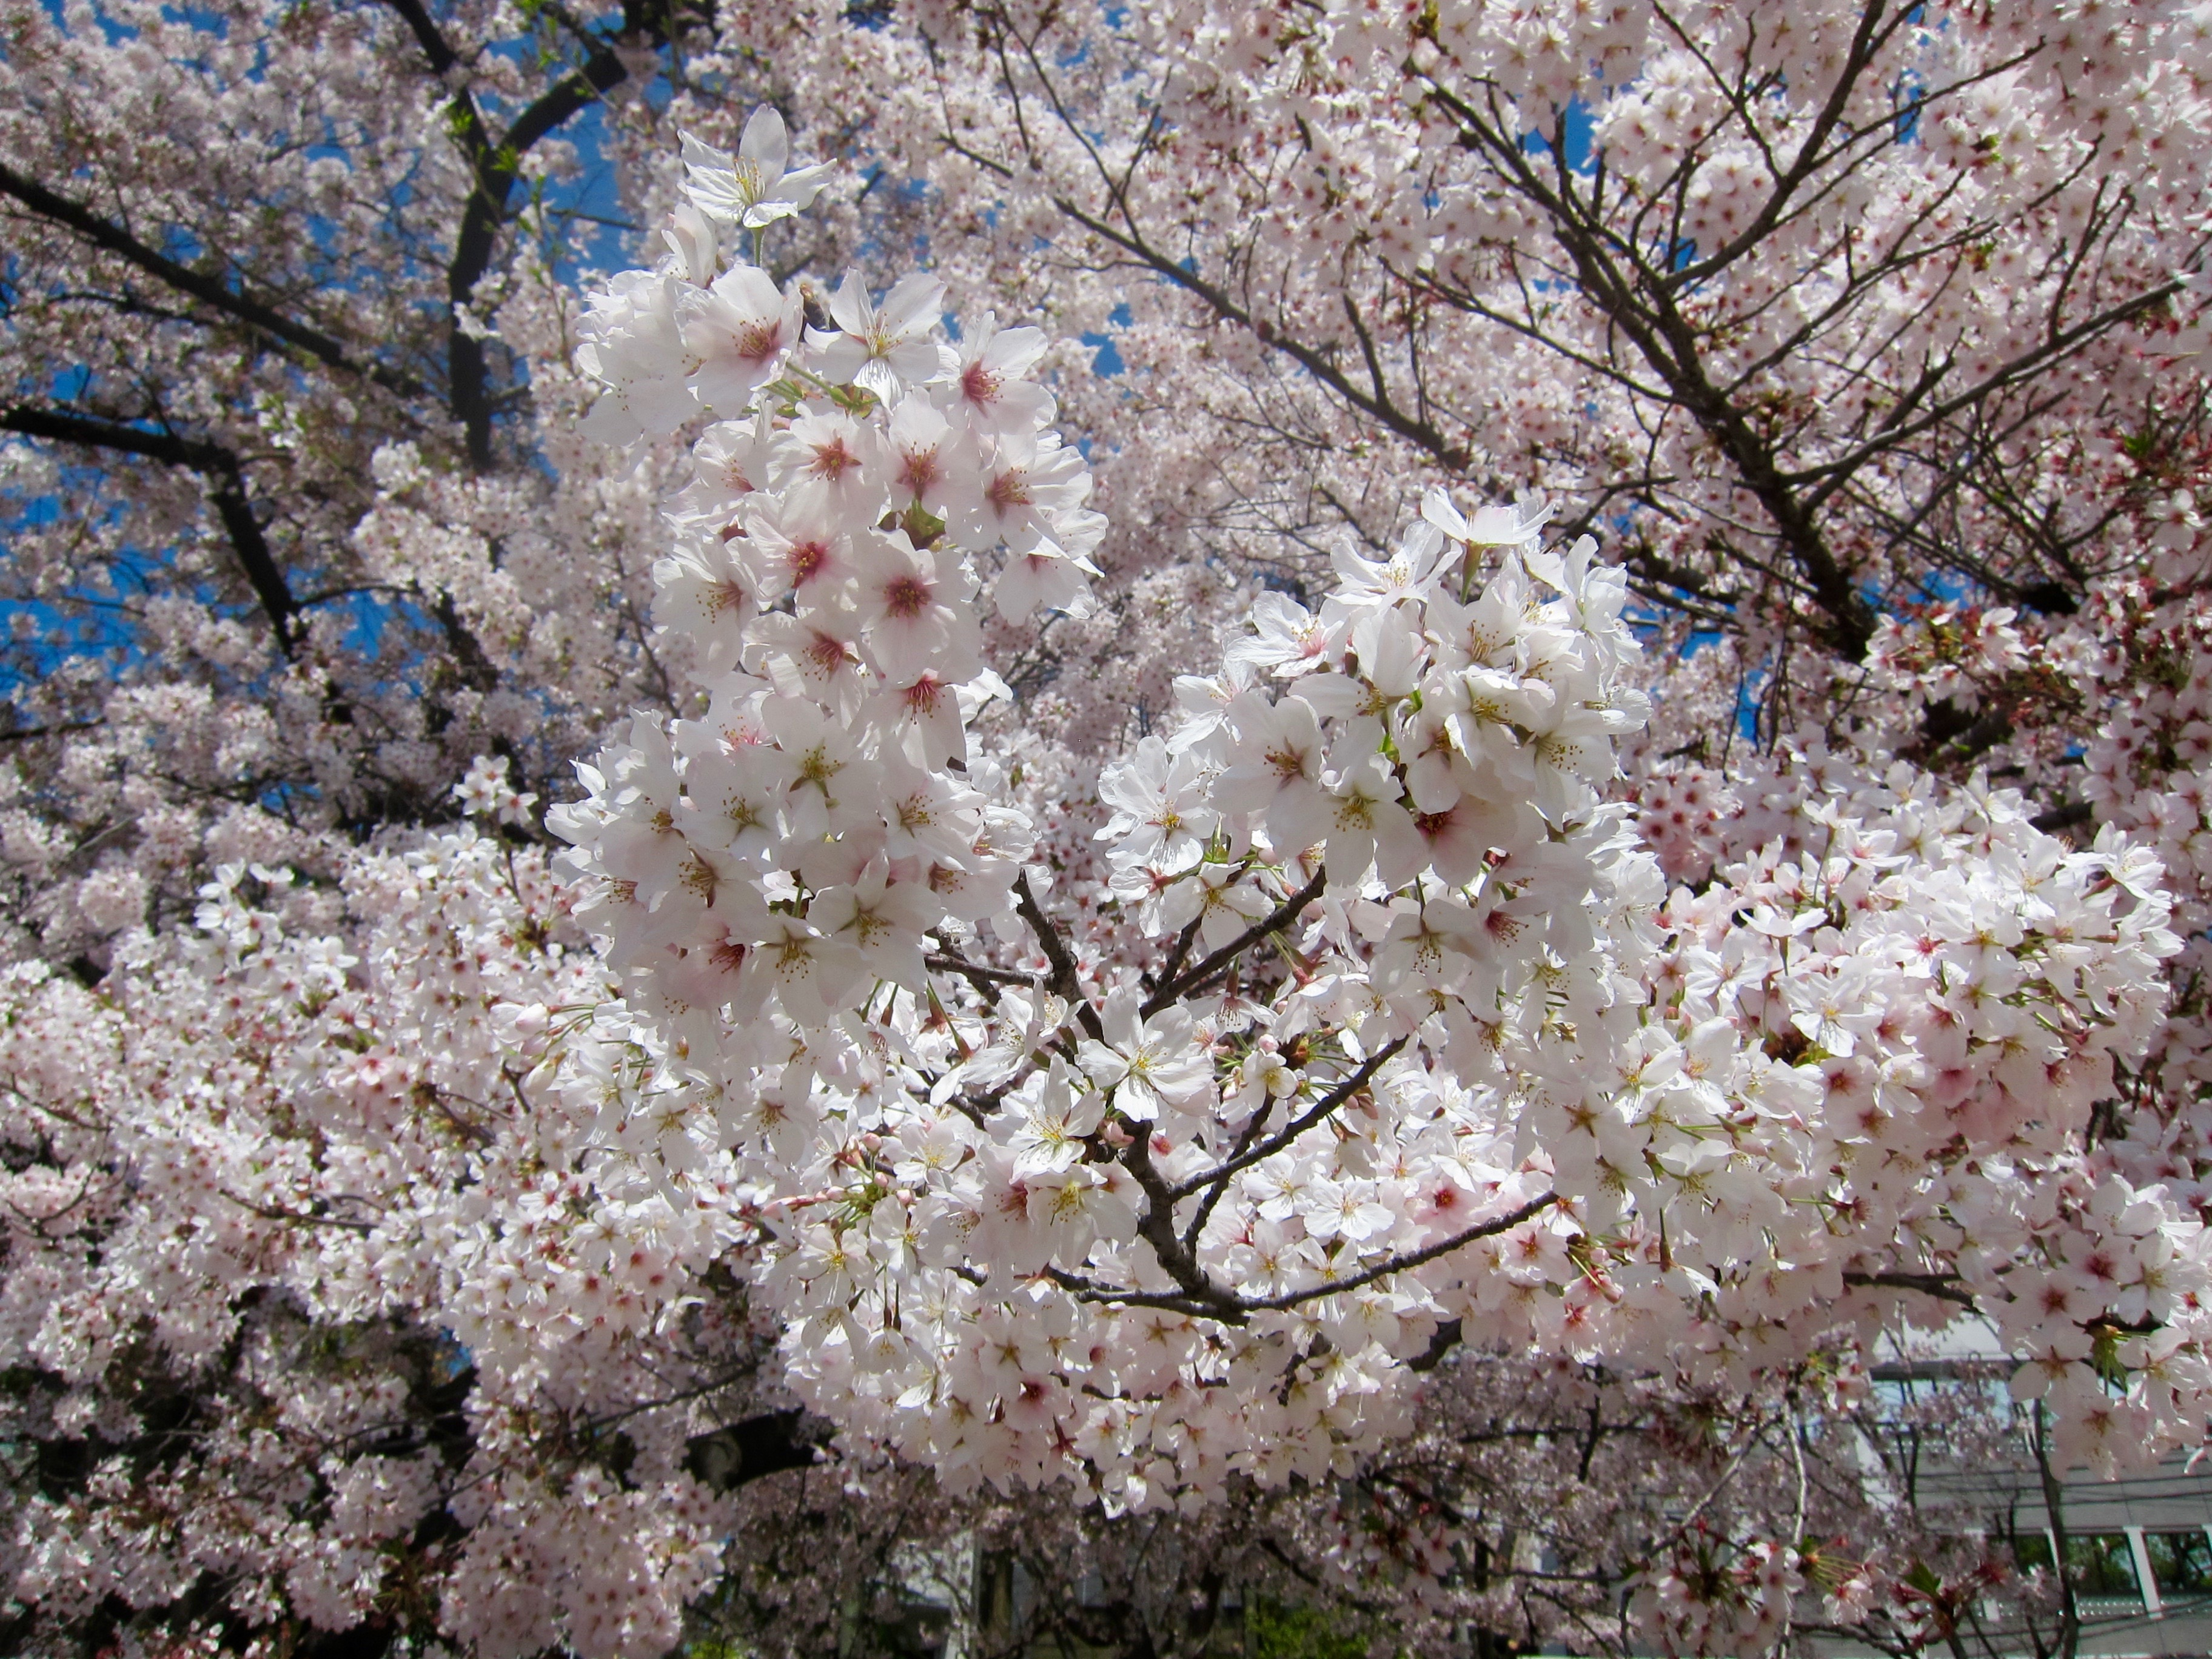 Cherries in full blown in Osaka, Japan.